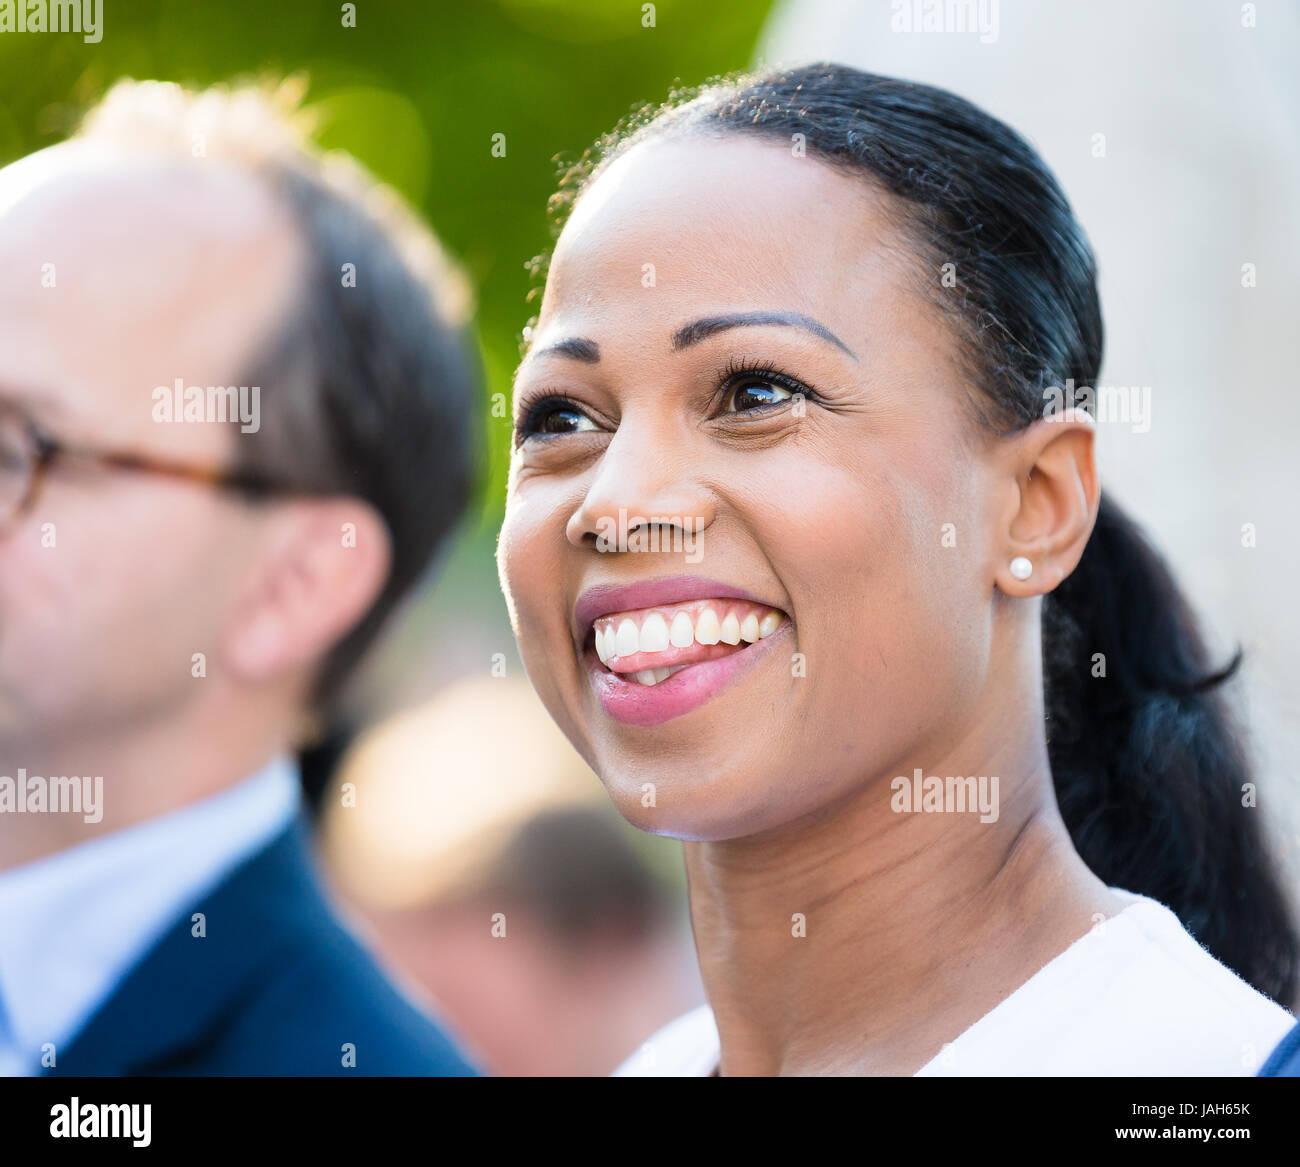 VISBY, SCHWEDEN. 8. Juli 2016.  Schwedens Kulturminister Alice Bah Kuhnke während einer Rede in Almedalen. Stockbild